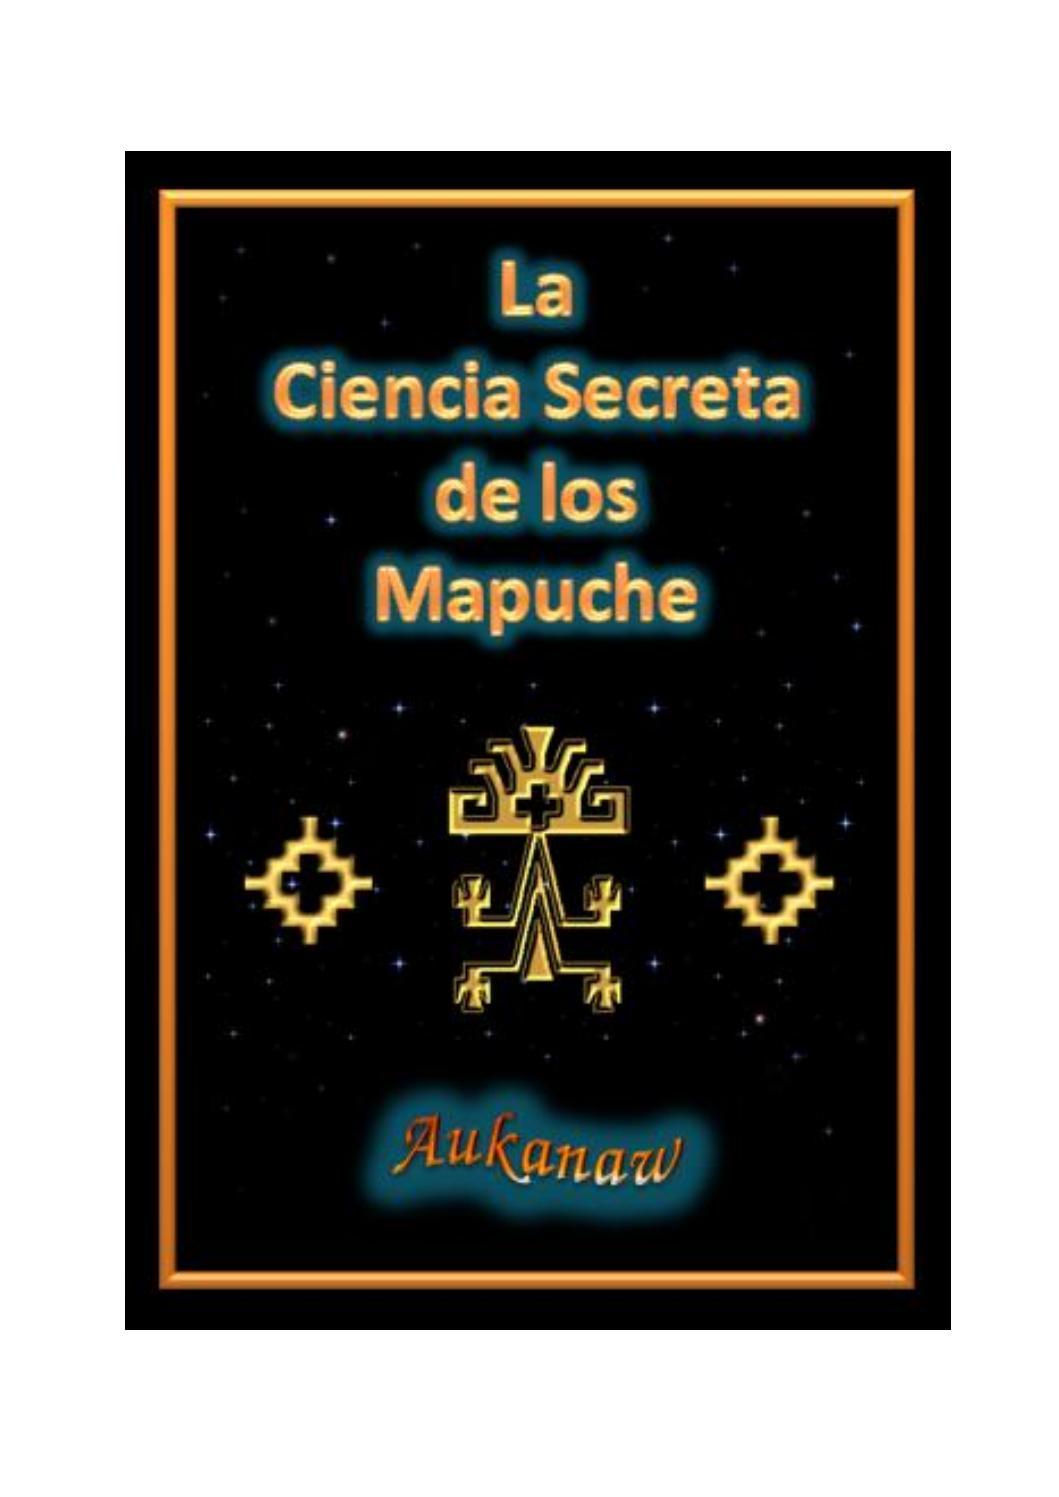 Aukanaw la ciencia secreta de los mapuche by Felipe Veliz - issuu